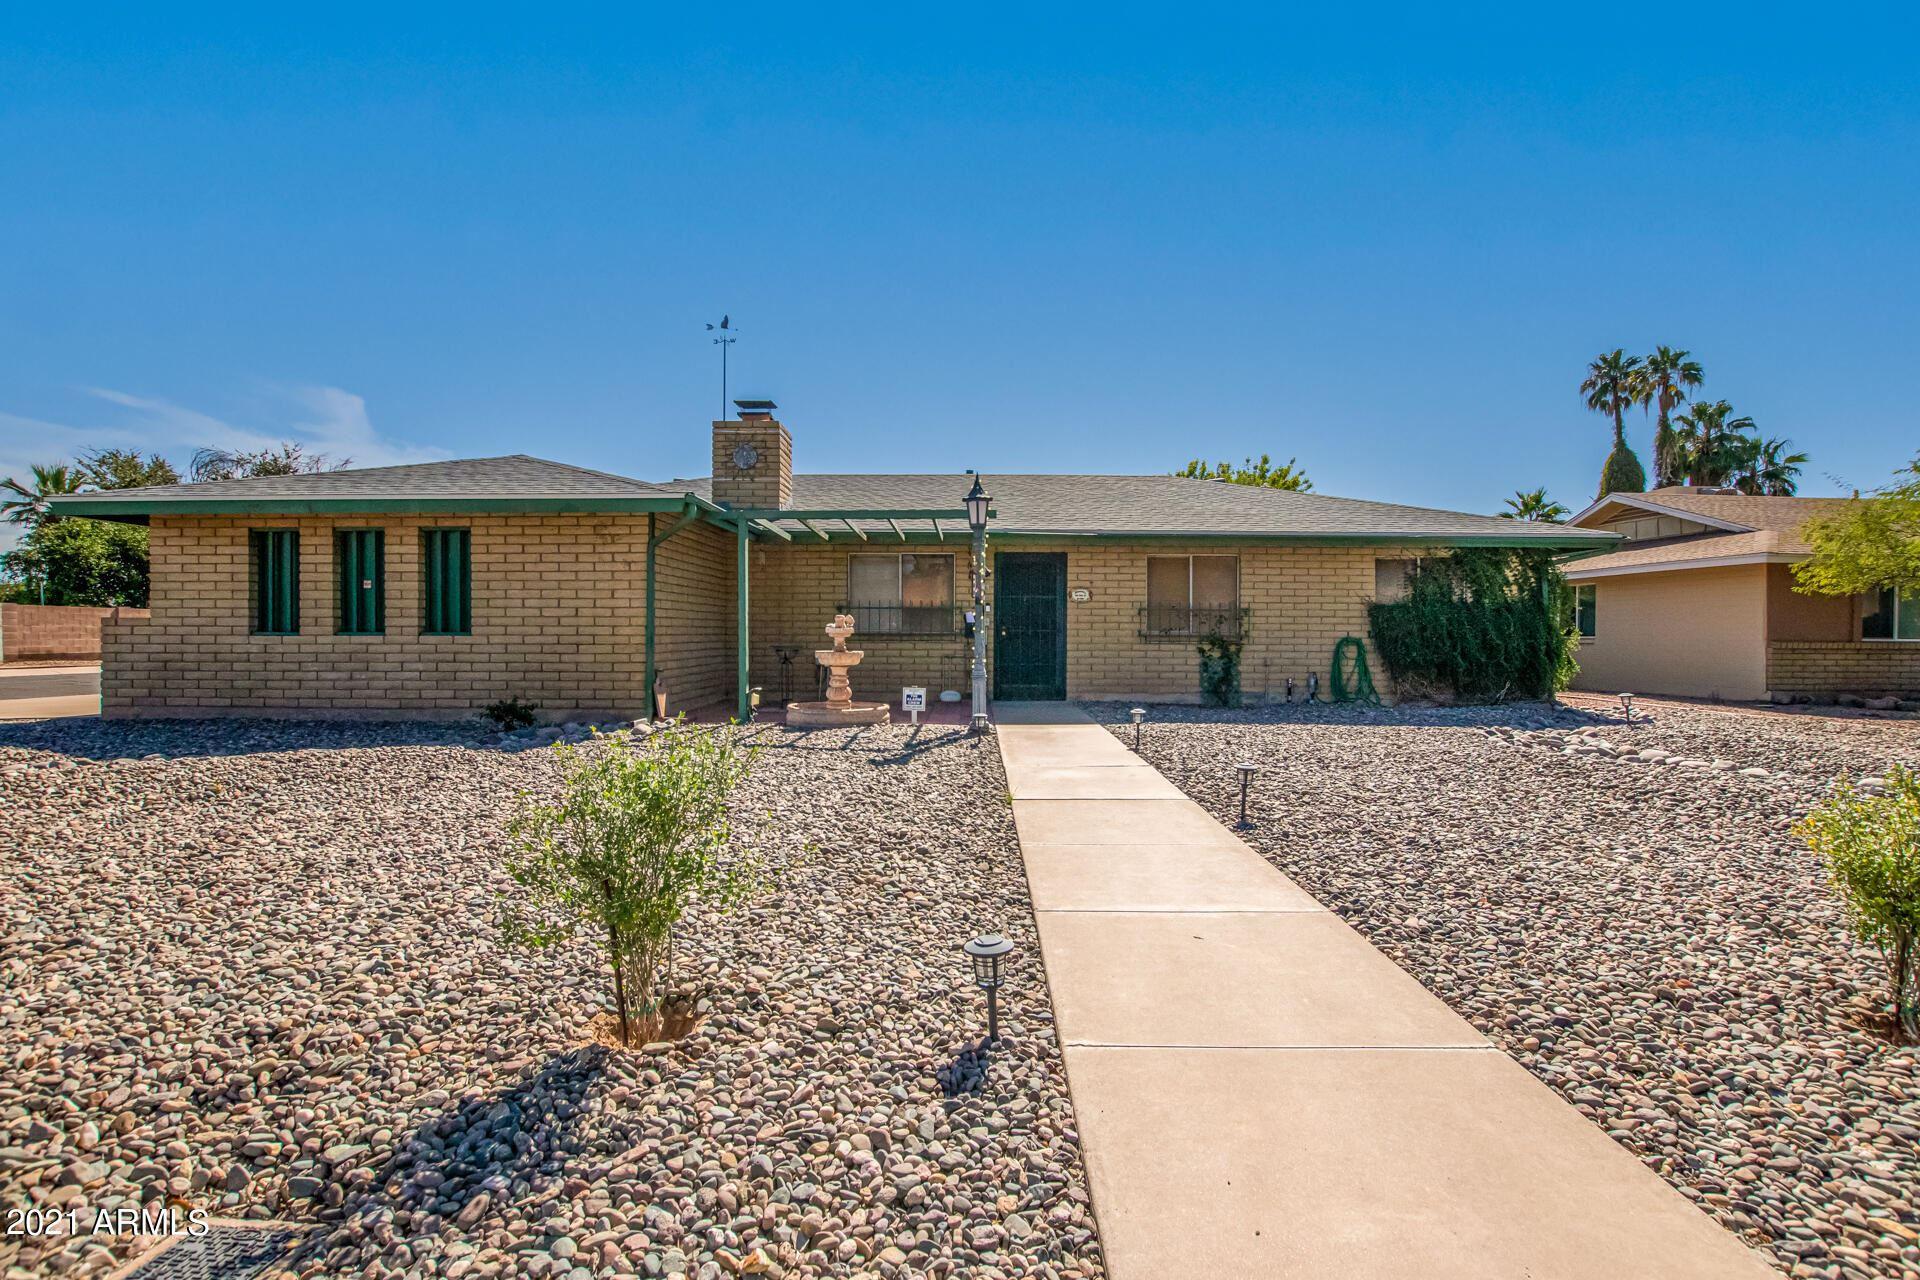 Photo of 435 E MINTON Drive, Tempe, AZ 85282 (MLS # 6310115)